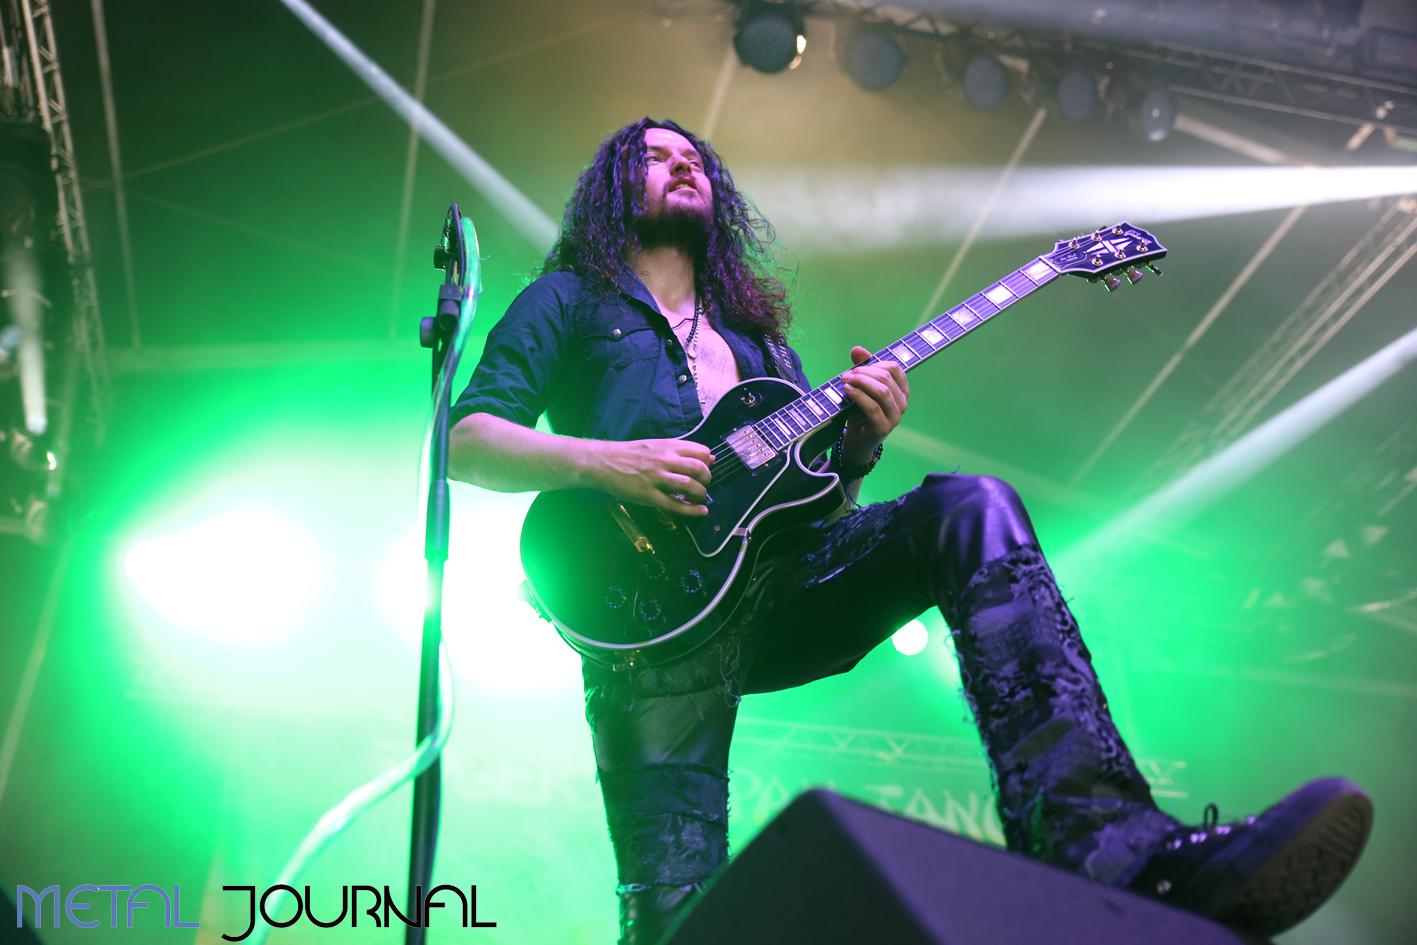 tygers of pan tang rock fest 18 - metal journal pic 6